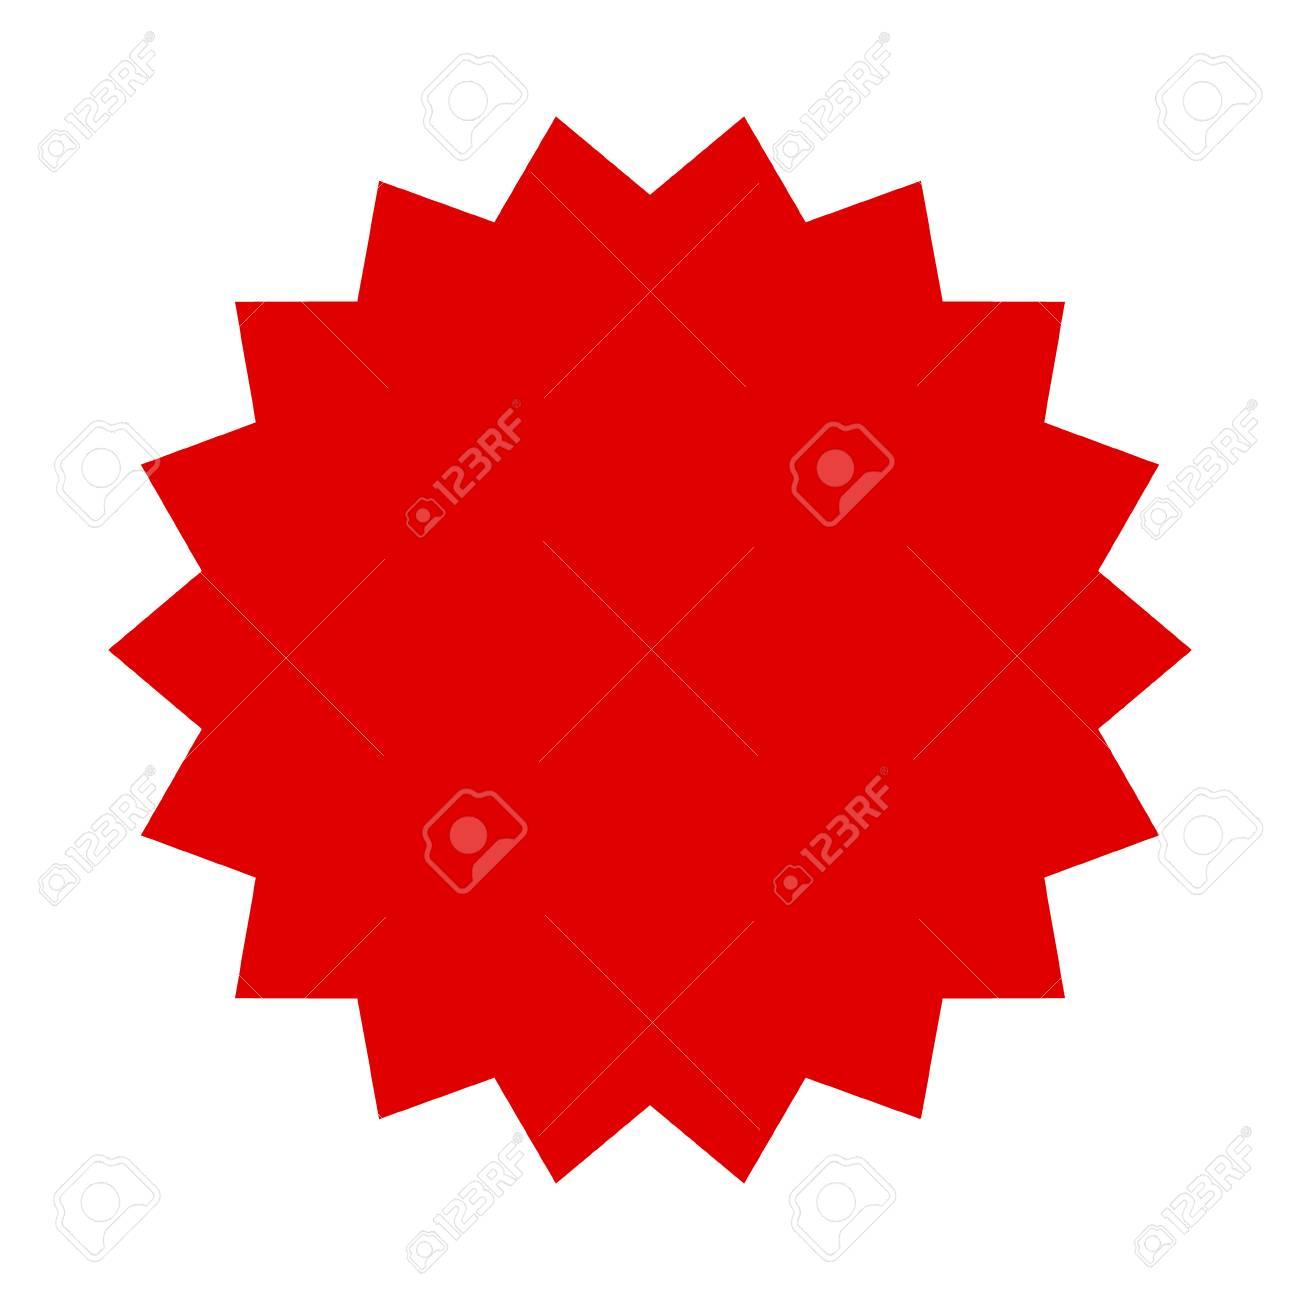 red starburst burst badge seal or label flat vector icon for rh 123rf com starburst vector swabbing starburst vector art free